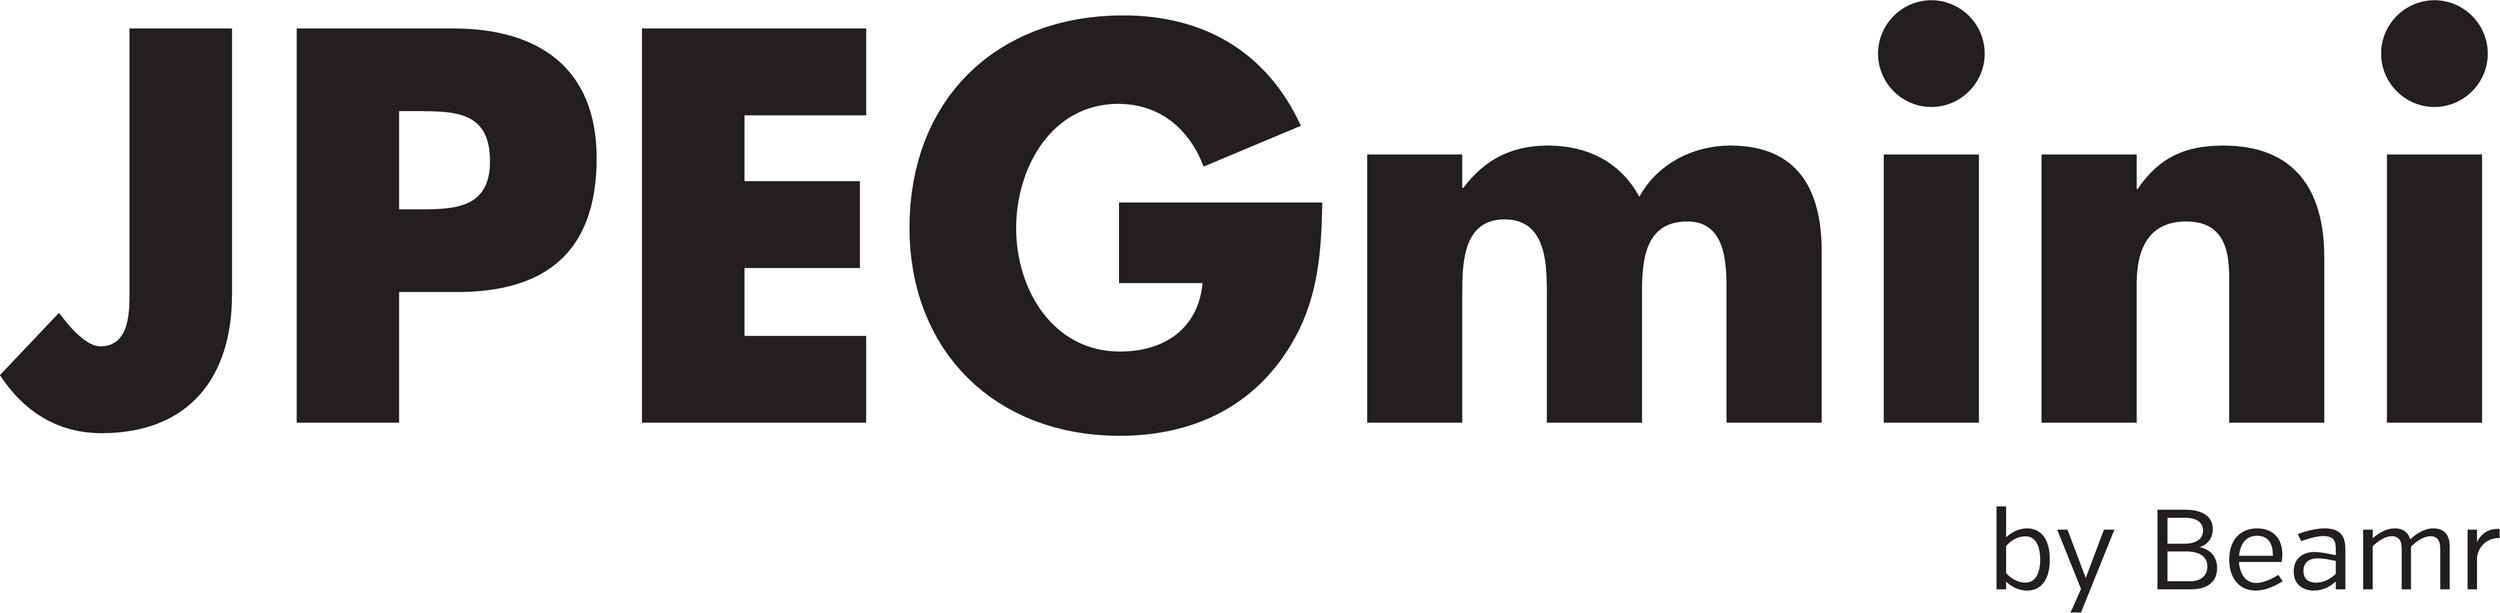 JPEGmini_Logo_pp.jpg